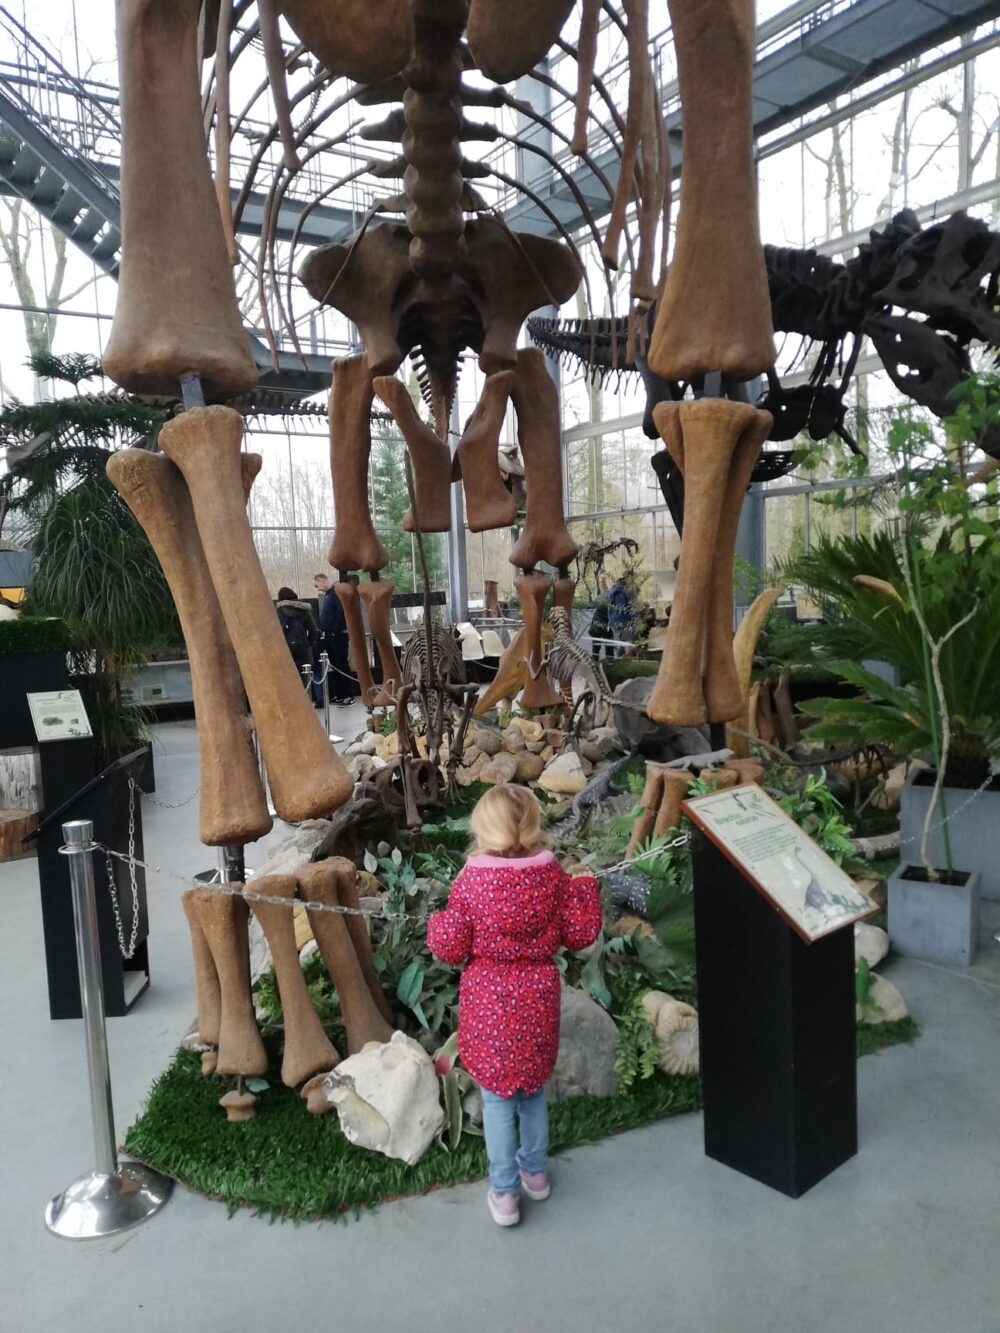 Oertijdmuseum-Boxtel-dinosaurussen